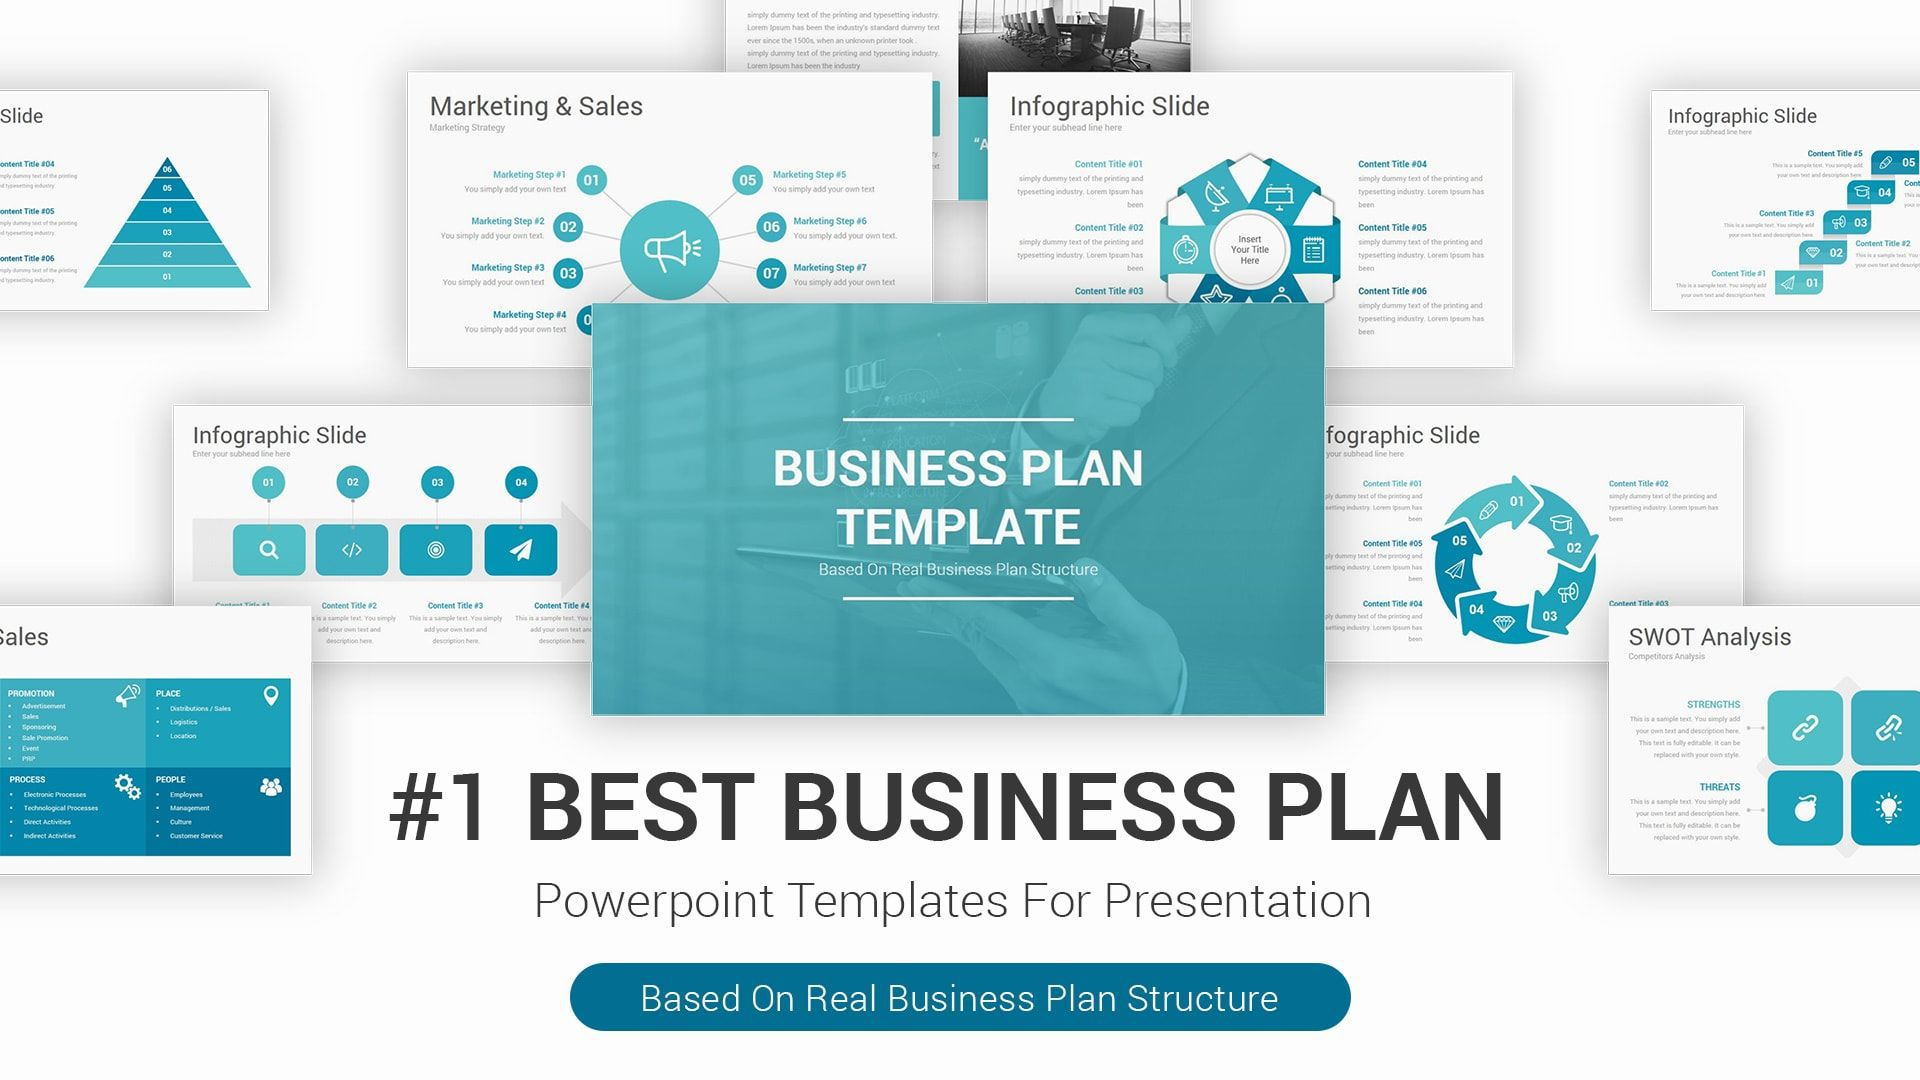 000 Impressive Free Download Busines Proposal Template Ppt Highest Clarity  Best Plan Sample Plan.ppt 2020Full